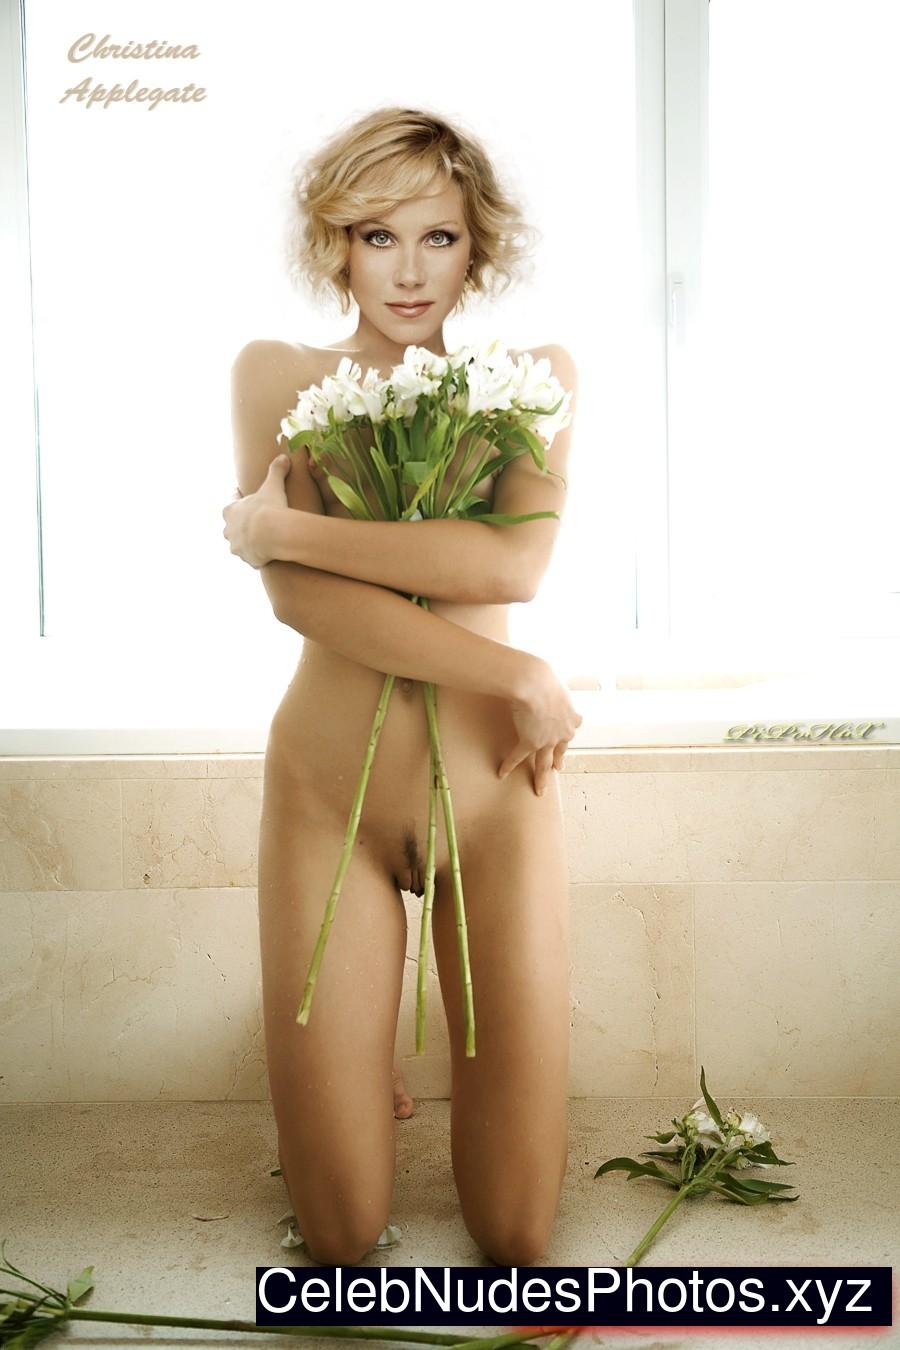 Christina Applegate Naked celebrity picture sexy 7